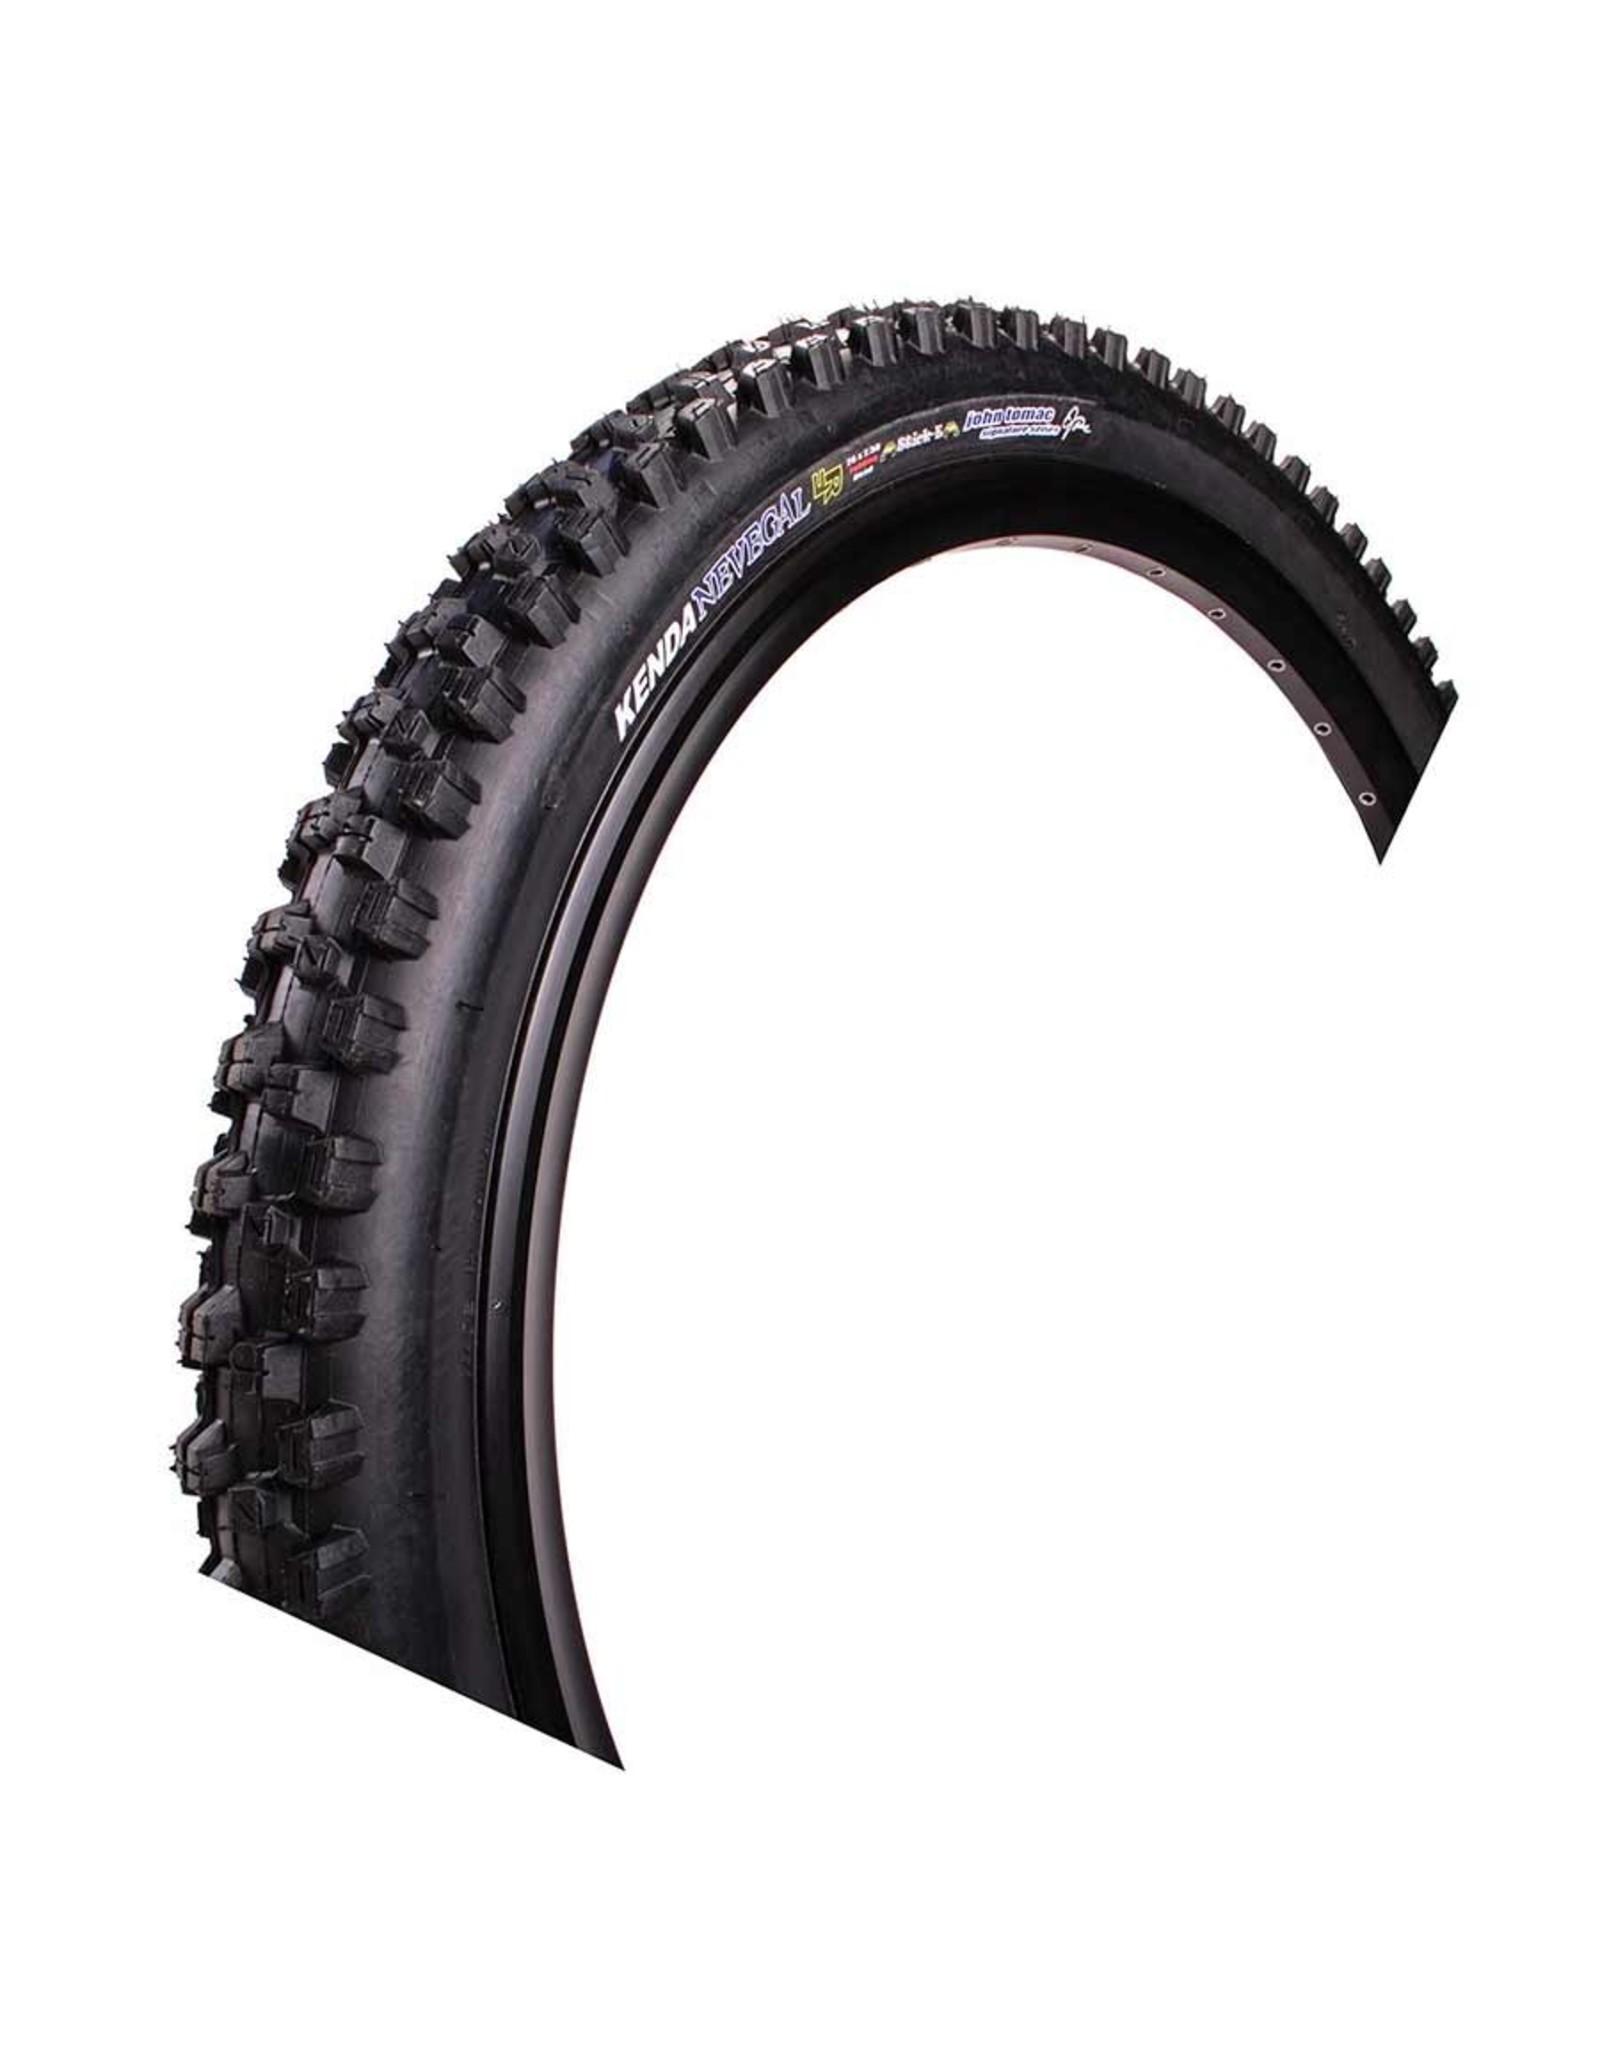 Kenda Kenda, Nevegal, Tire, 26''x2.10, Folding, Clincher, DTC, 120TPI, Black